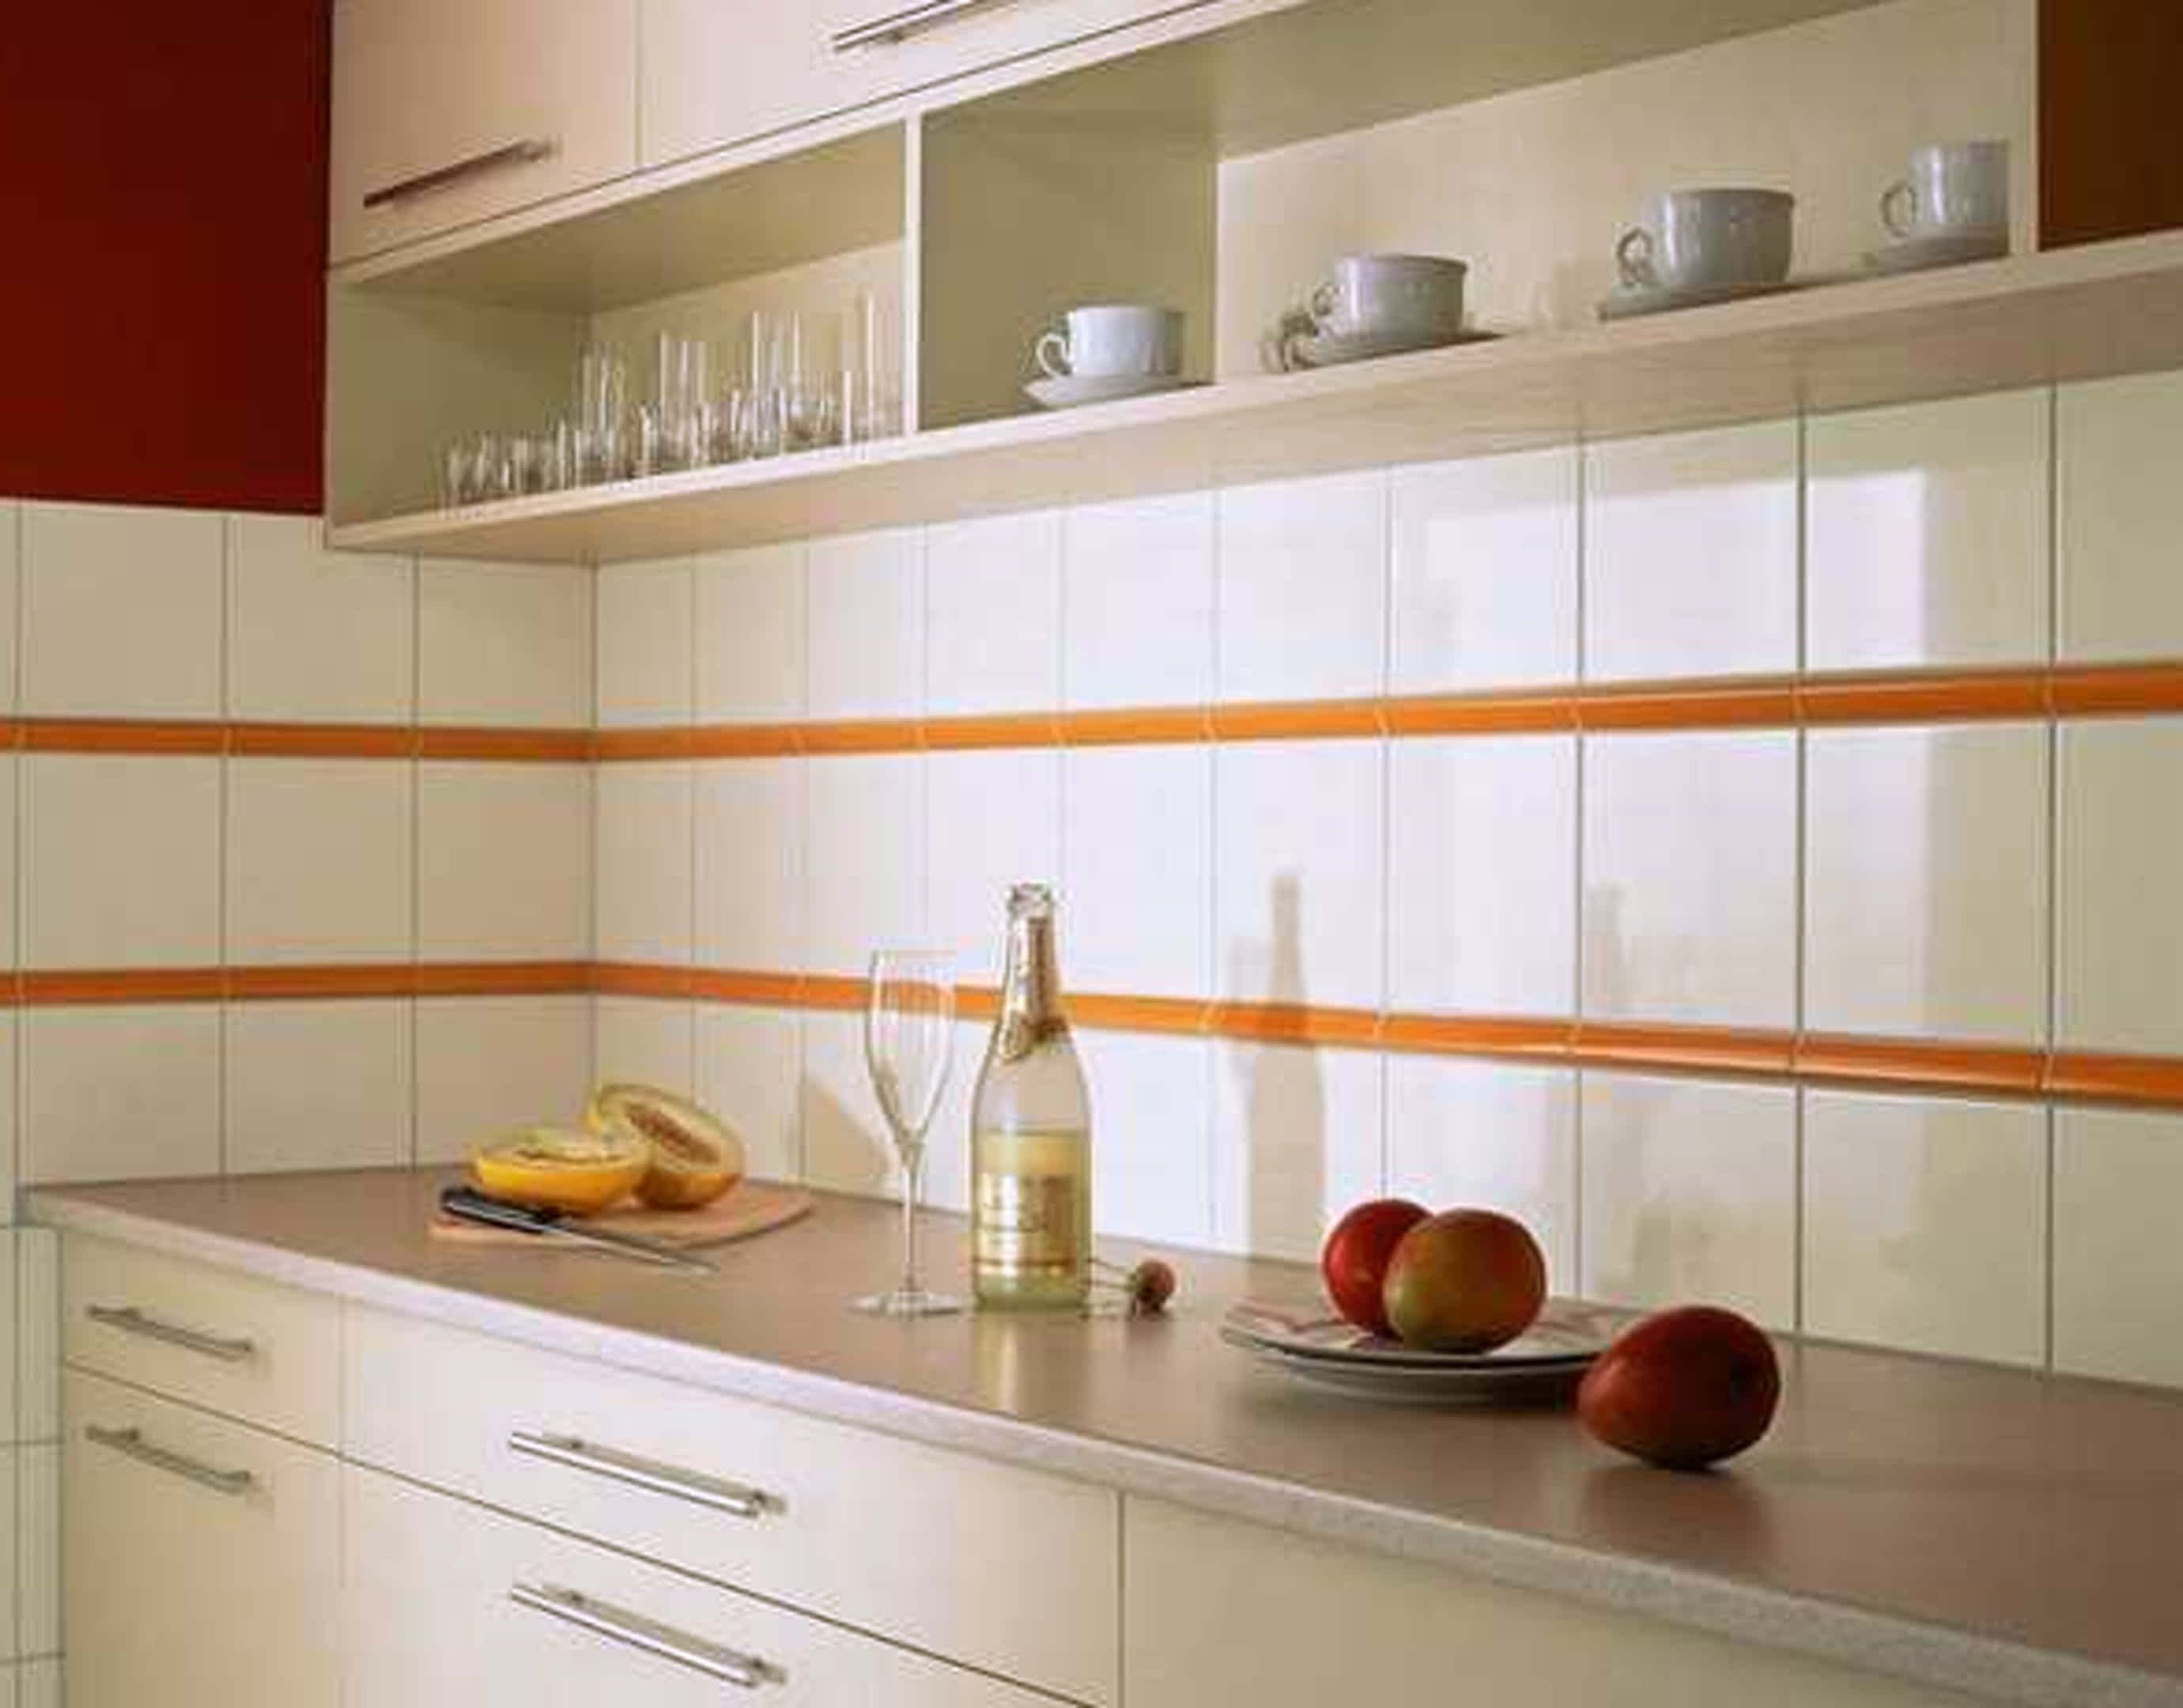 34 Attractive Designer Tiles Kitchen Tiles Design Kitchen Wall Tiles Design Kitchen Wall Design